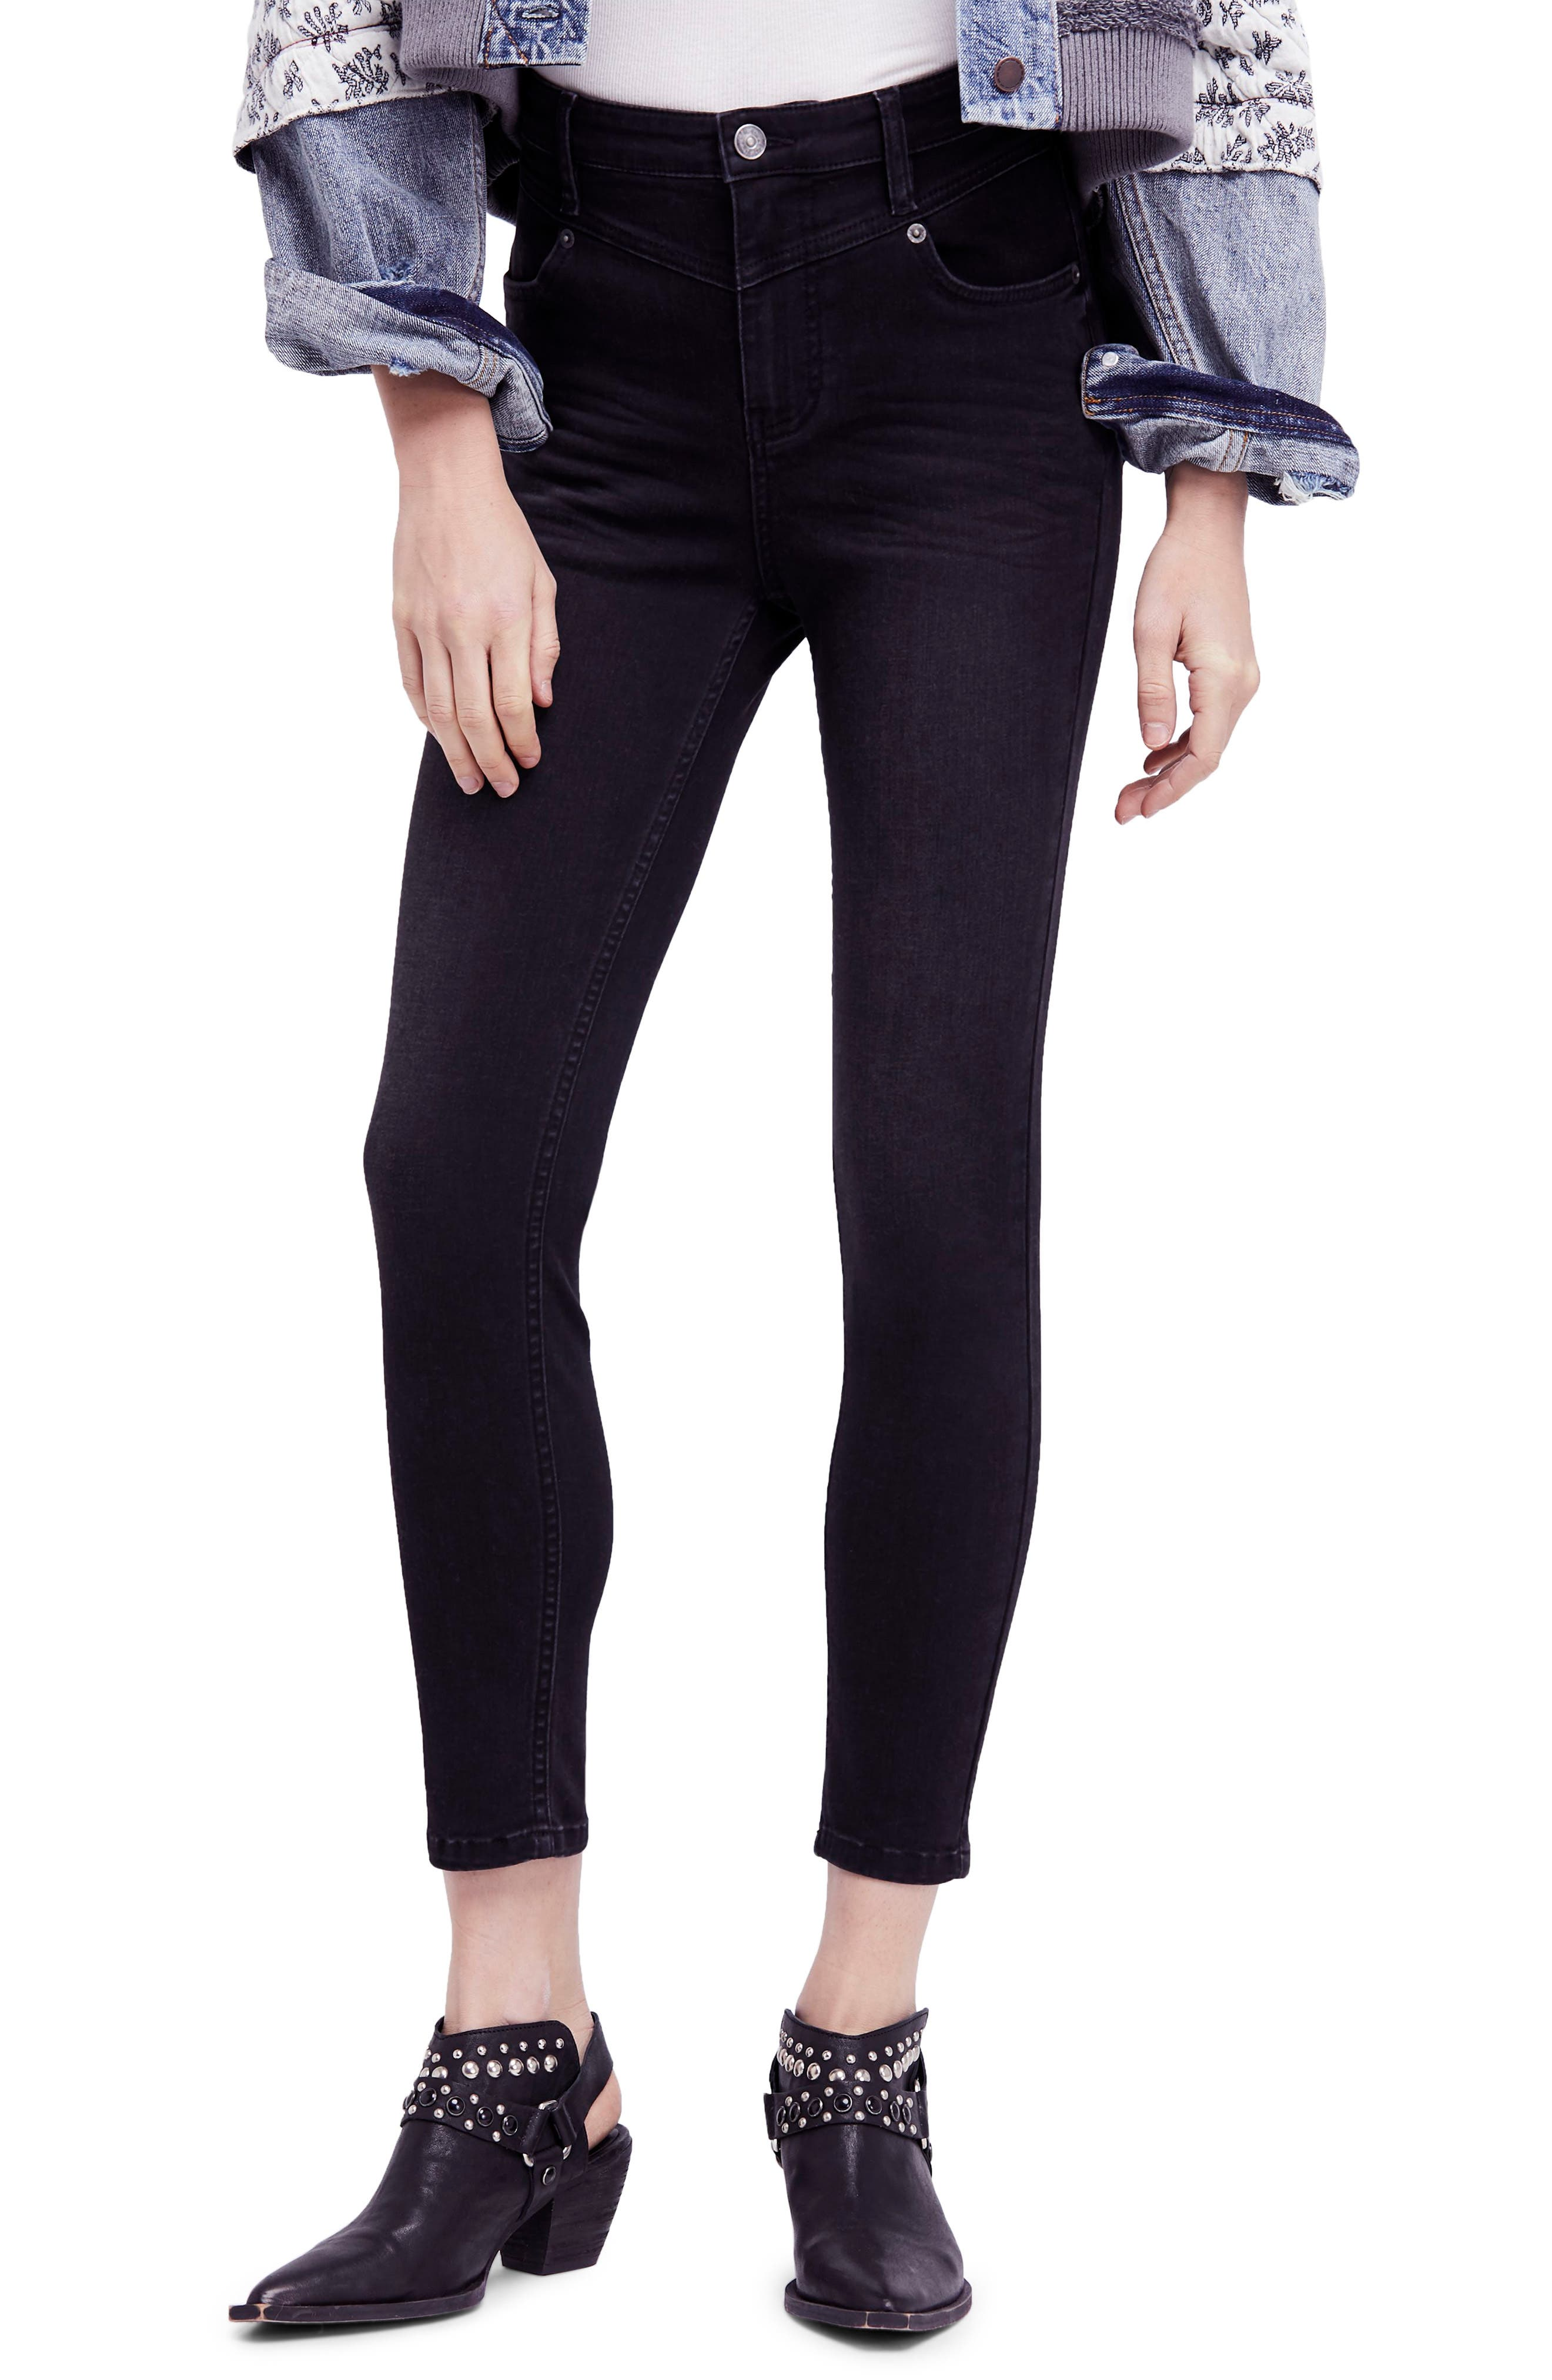 Mara Skinny Jeans,                             Main thumbnail 1, color,                             Black